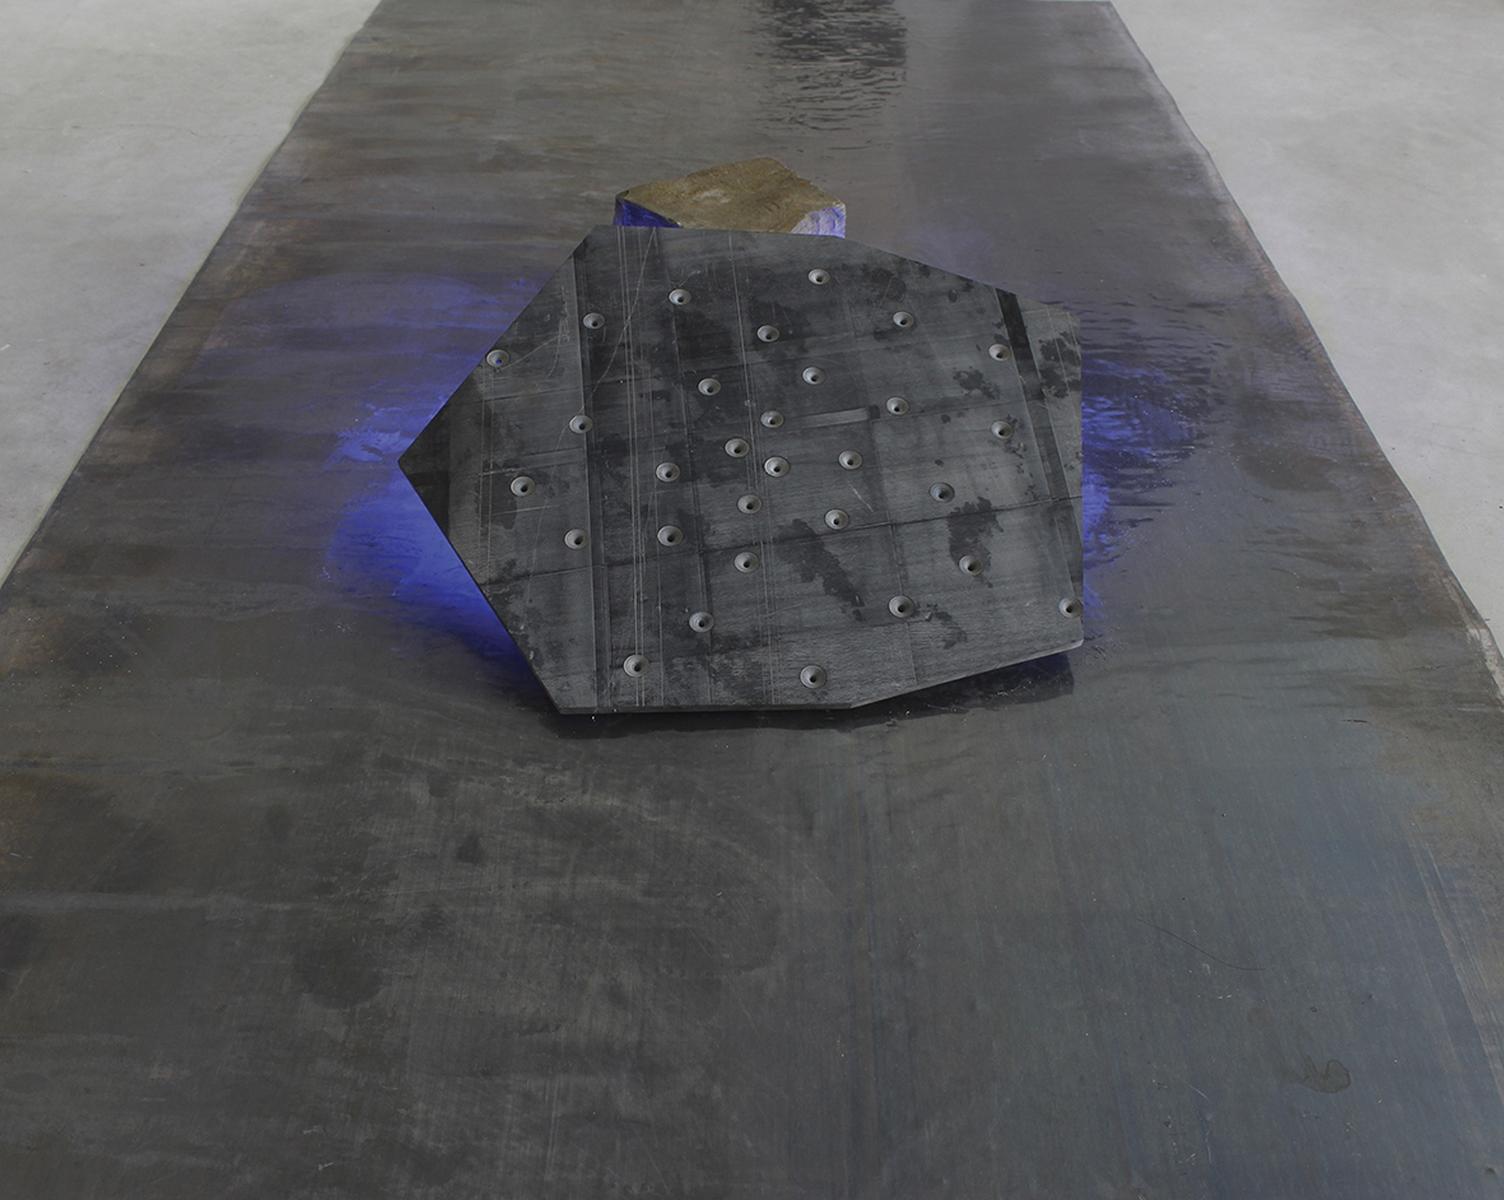 Roberto Rocchi, Frammento notturno, 2018, marmo nero, piombo, pigmento, led, cm 200x100x15